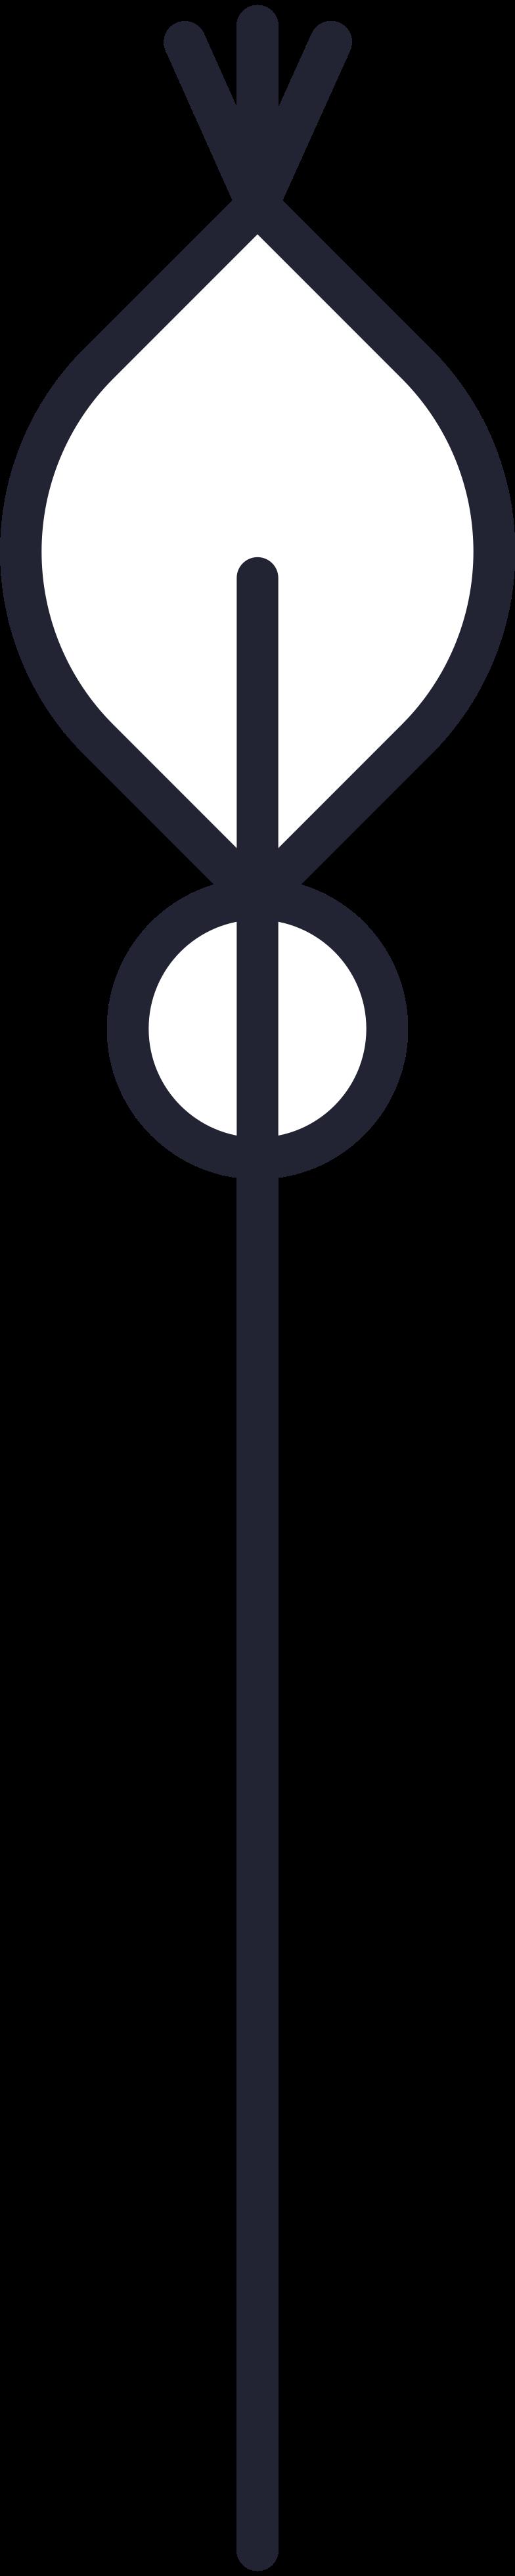 unsubscribed  flower Clipart illustration in PNG, SVG